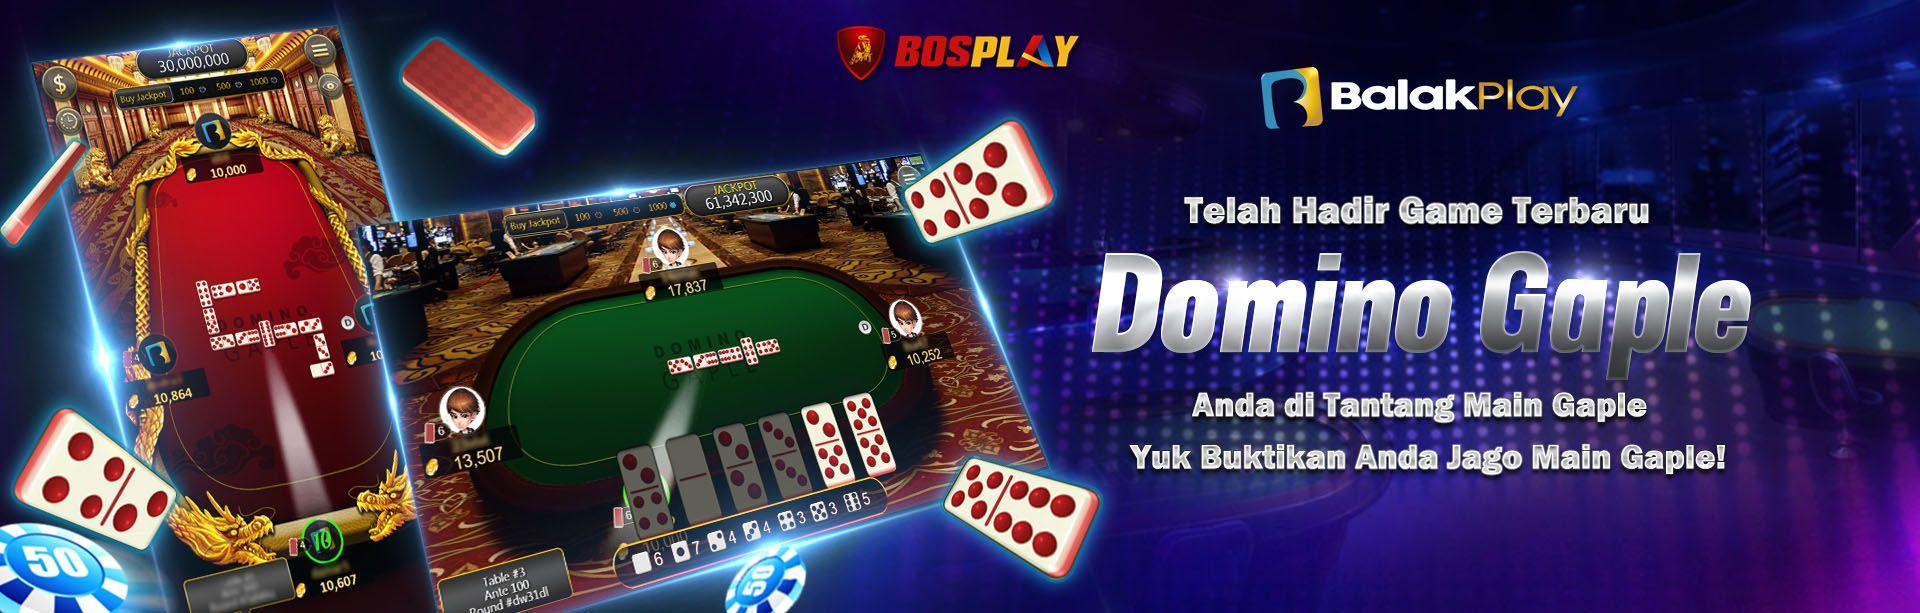 Deposit Domino Gaple Via Ovo Cash Indonesia Game Poker